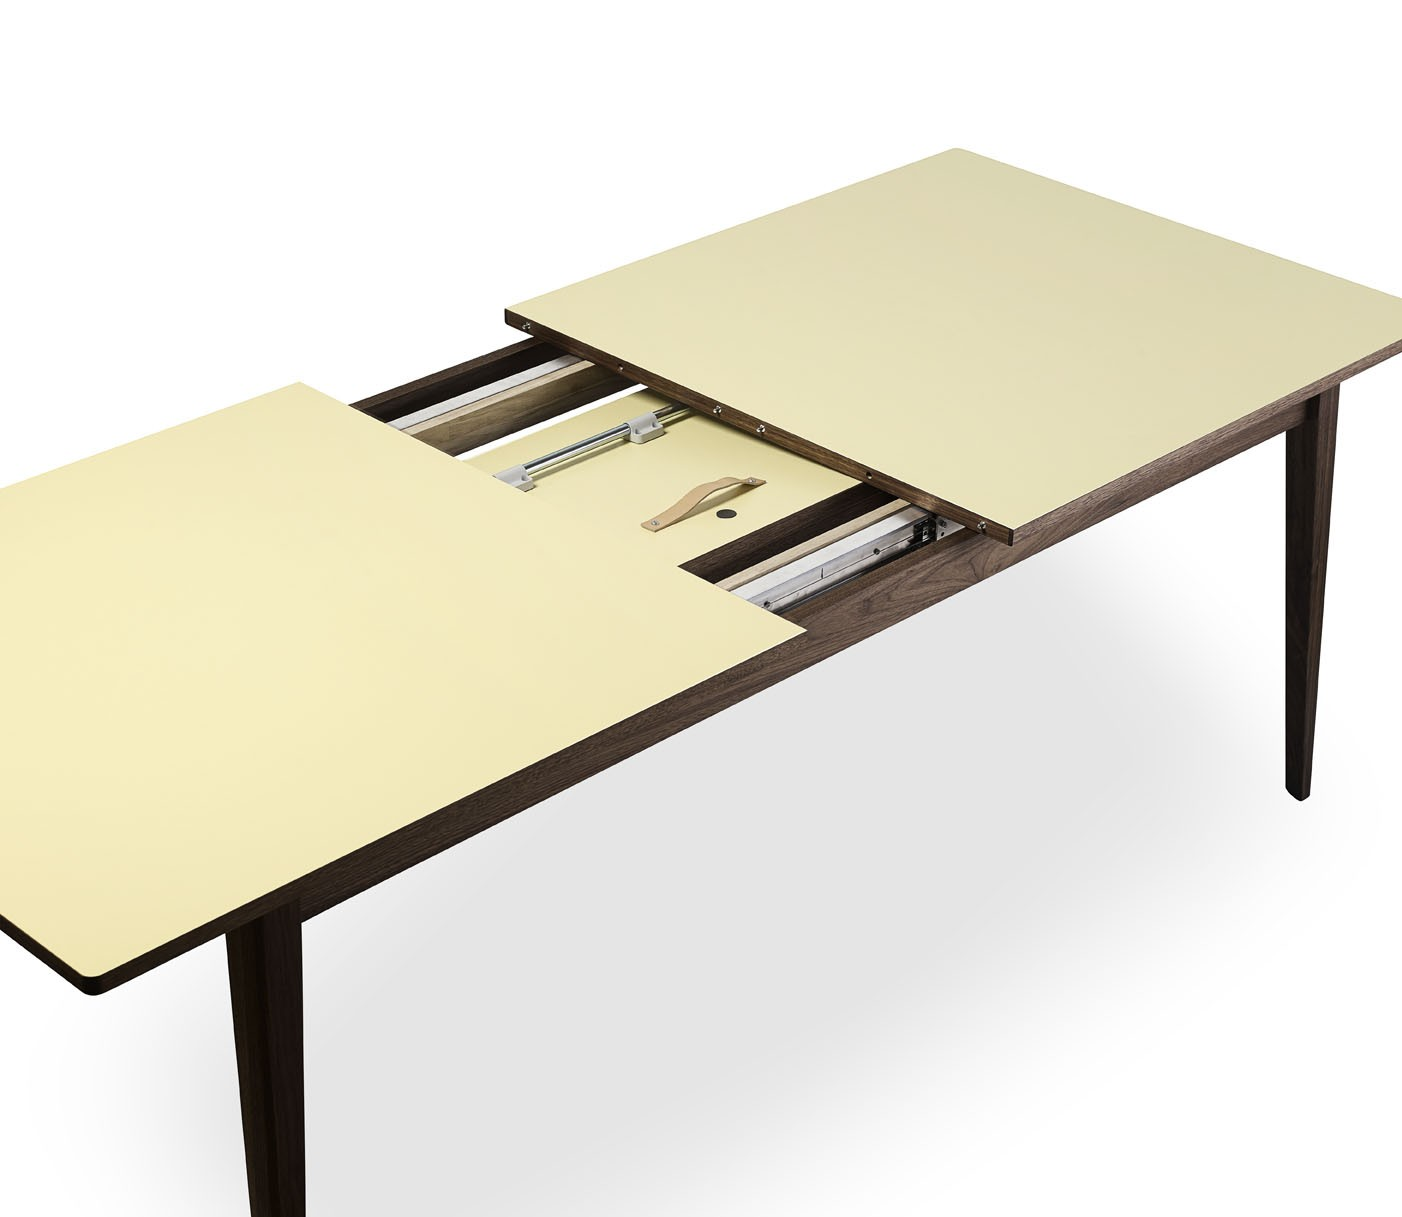 spisebord laminat T3 Papillon spisebord bykato med butterfly plade i laminat spisebord laminat